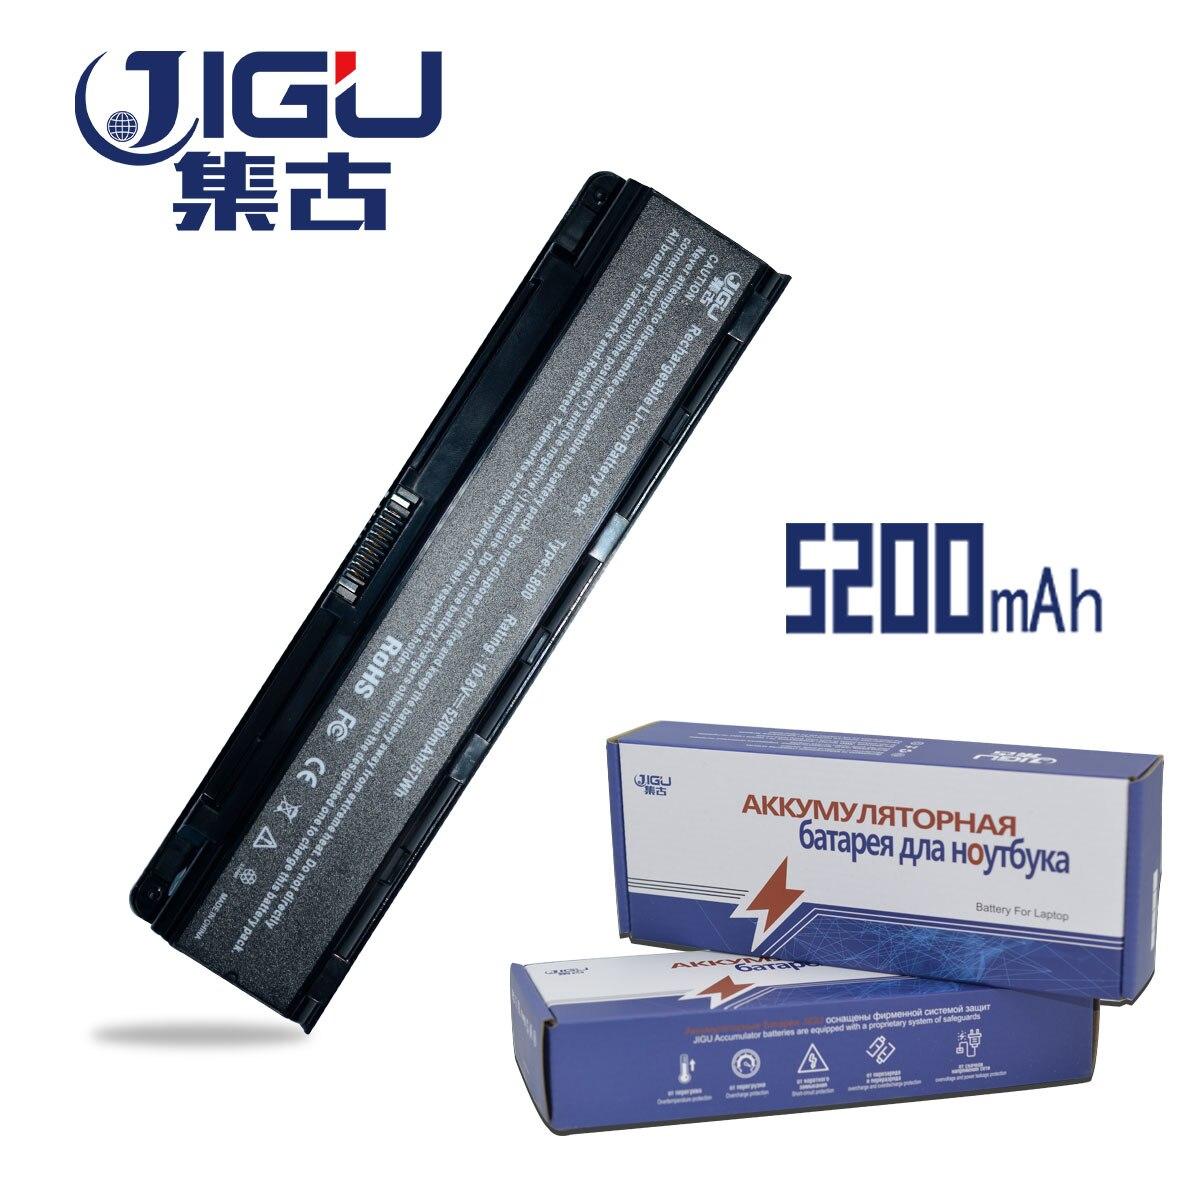 Image 2 - JIGU NEW Laptop Battery PA5023U 1BRS PA5024U 1BRS PA5025U 1BRS PA5026U 1BRS For Toshiba Toshiba Dynabook Qosmio T752-in Laptop Batteries from Computer & Office